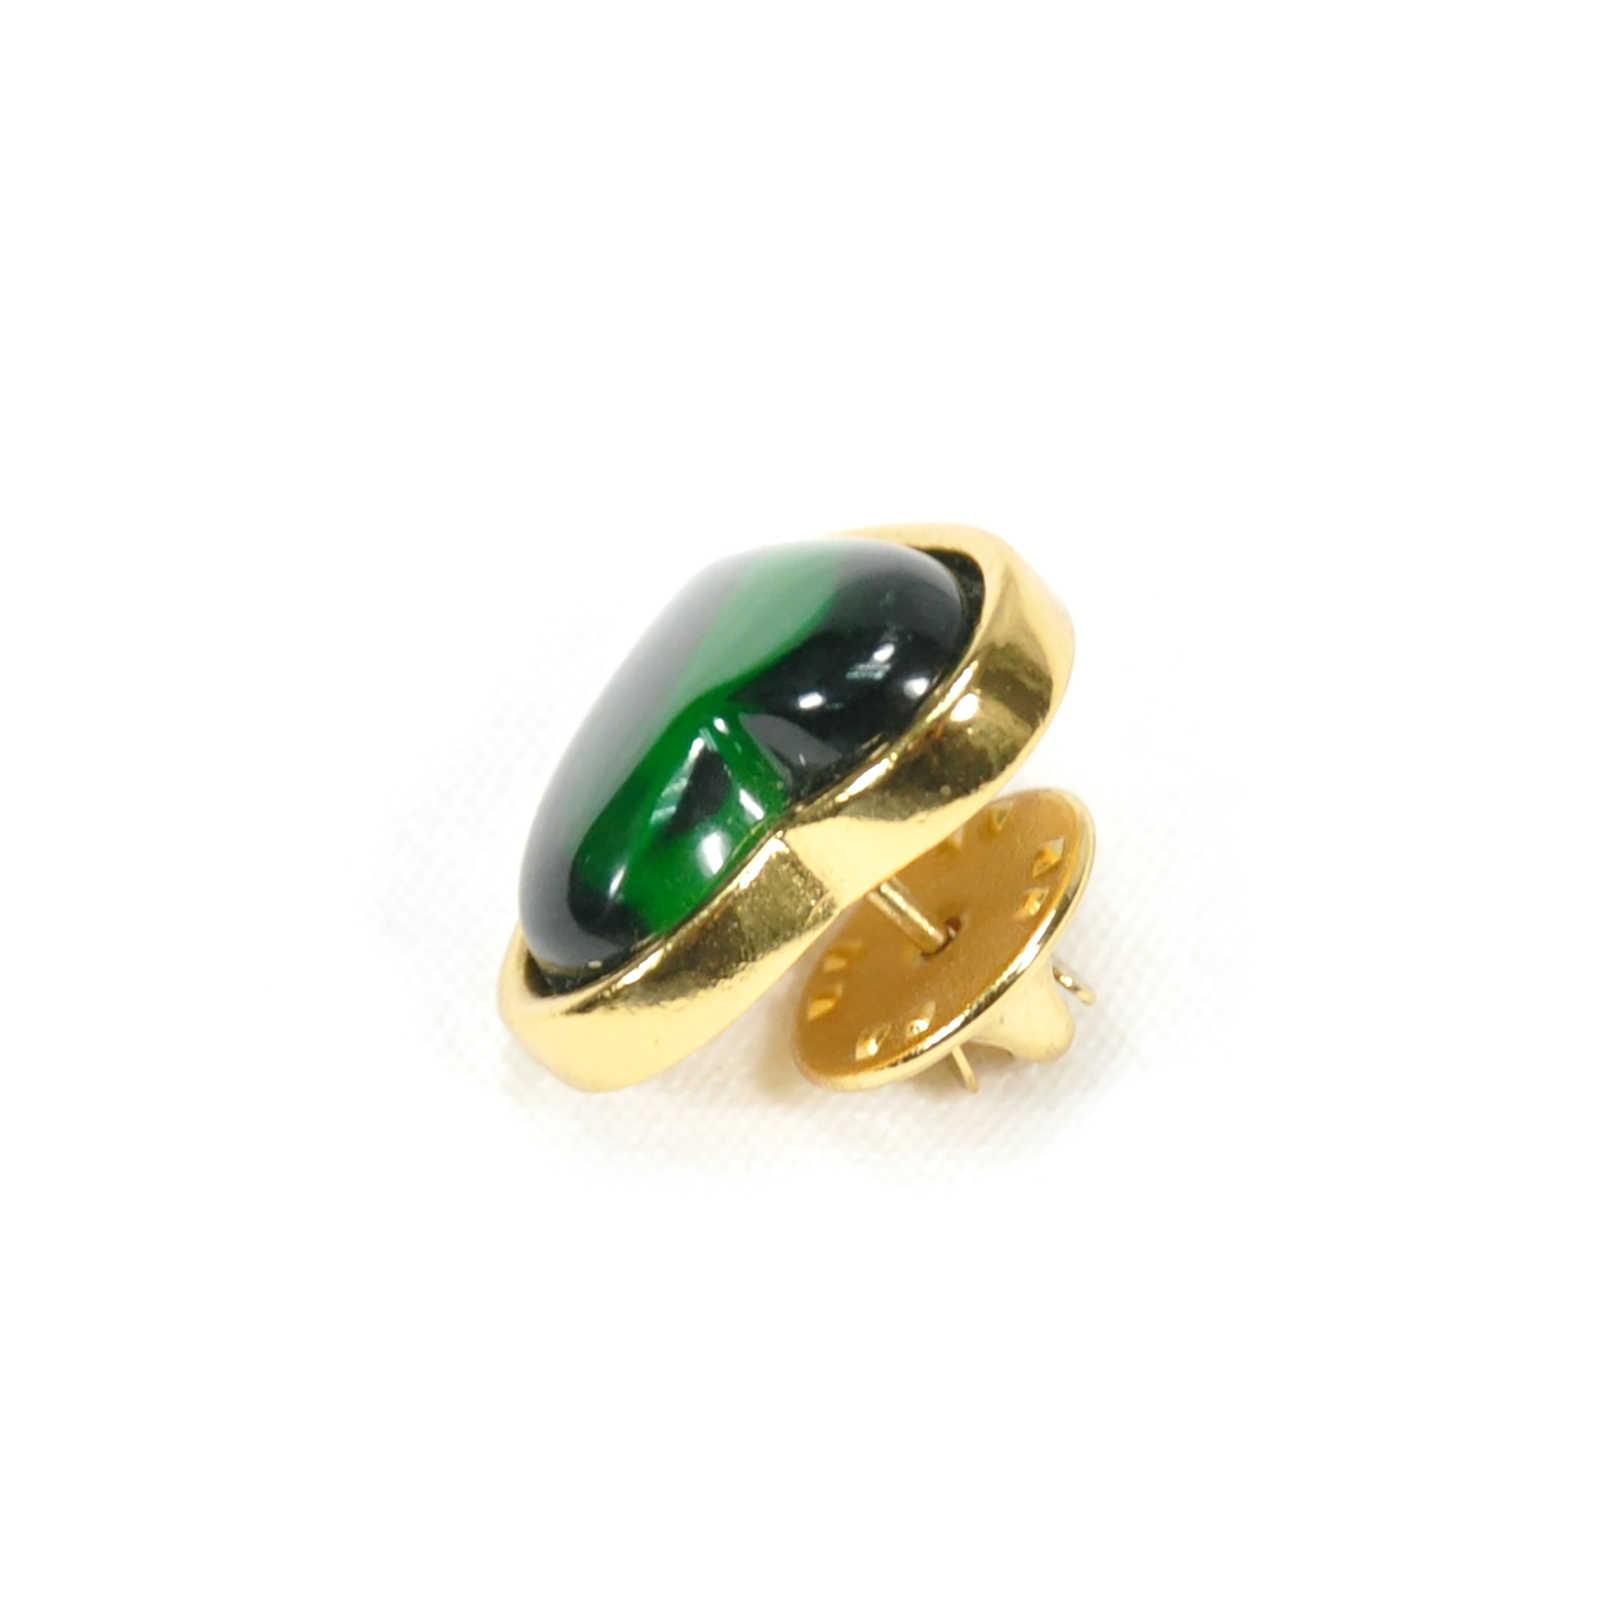 0fd09ffaa09 ... Authentic Vintage Yves Saint Laurent Glass Heart Brooch Green  (TFC-203-00034) ...